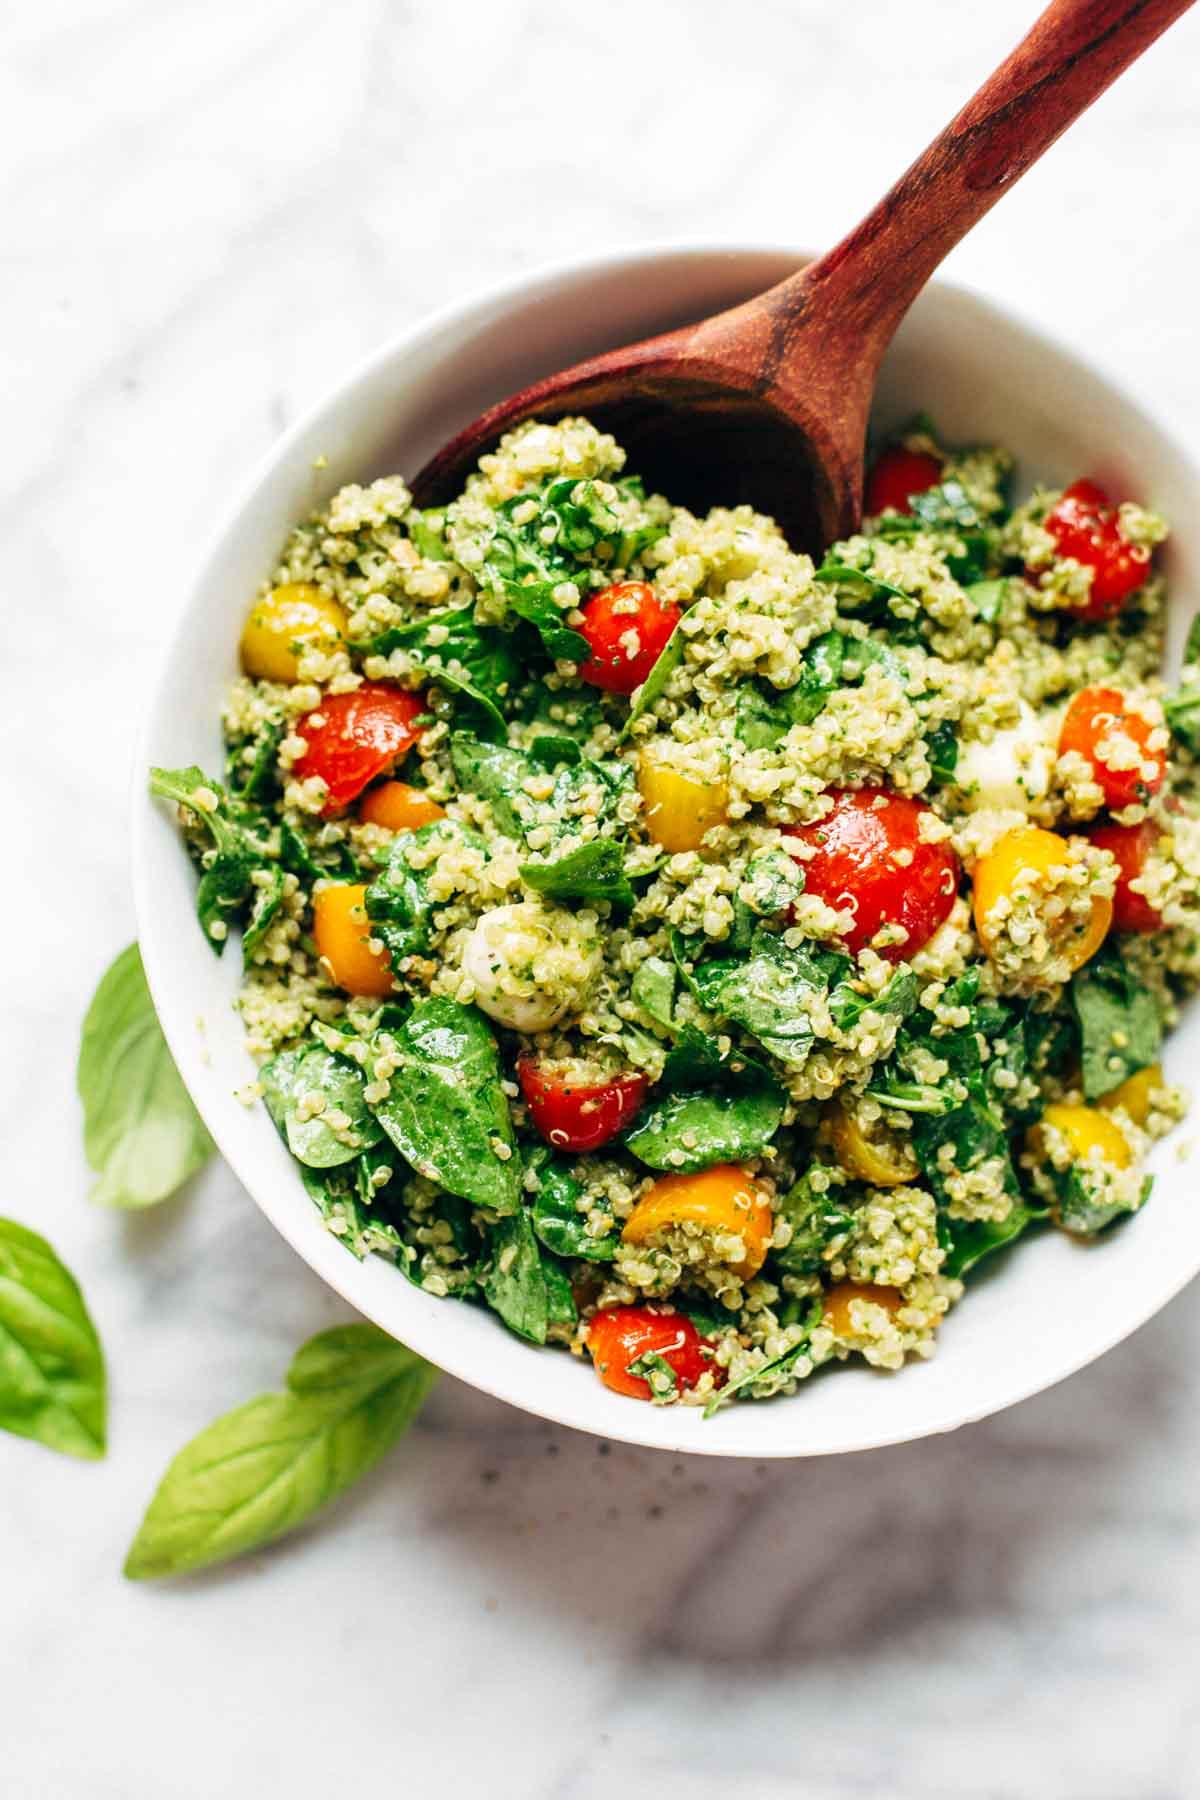 Healthy Summer Vegetarian Recipes  Green Goddess Quinoa Summer Salad Recipe Pinch of Yum